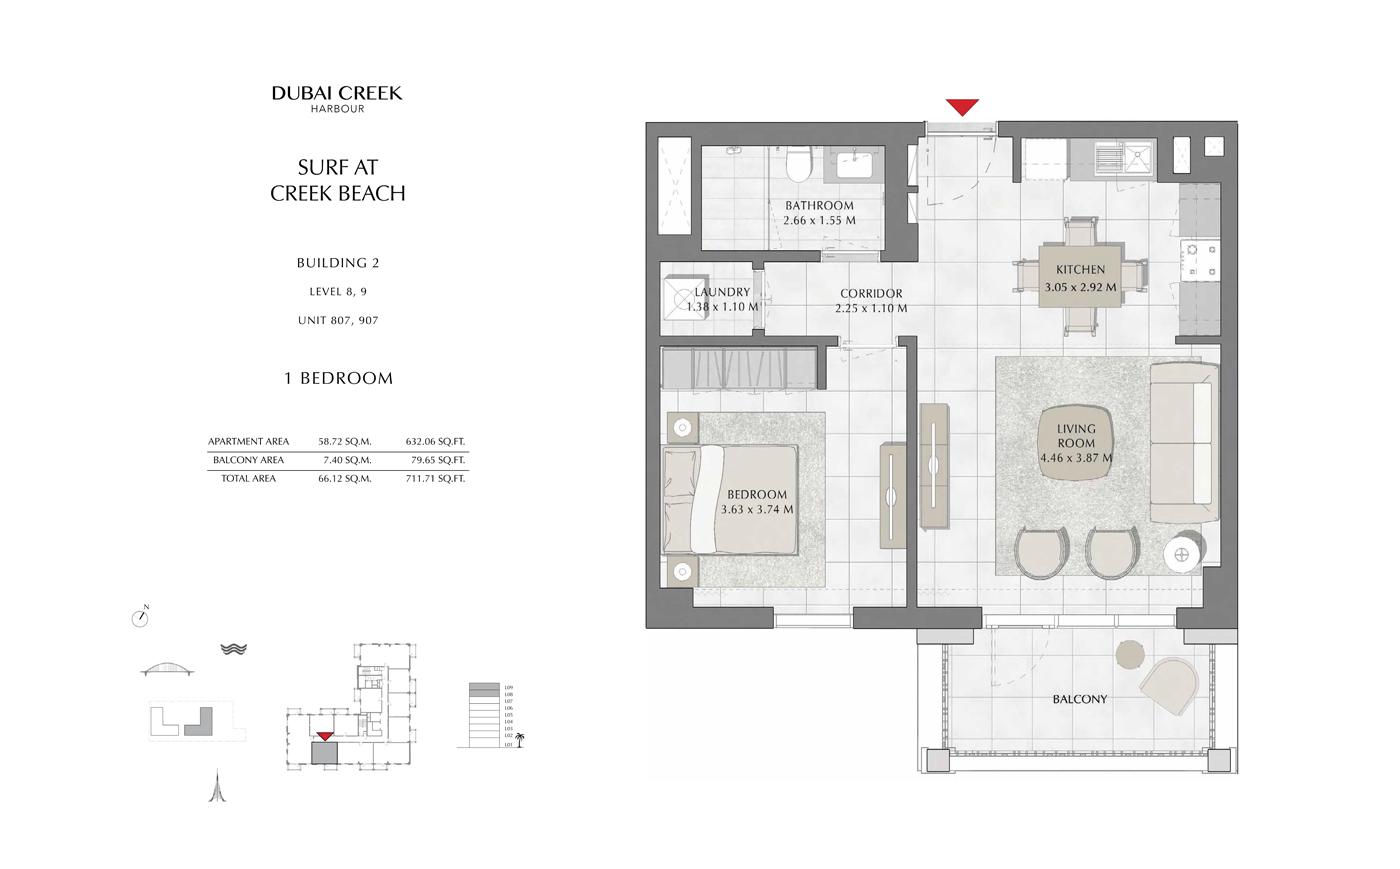 Building 2, 1 Bedroom Level 8, 9, Size 711 Sq Ft